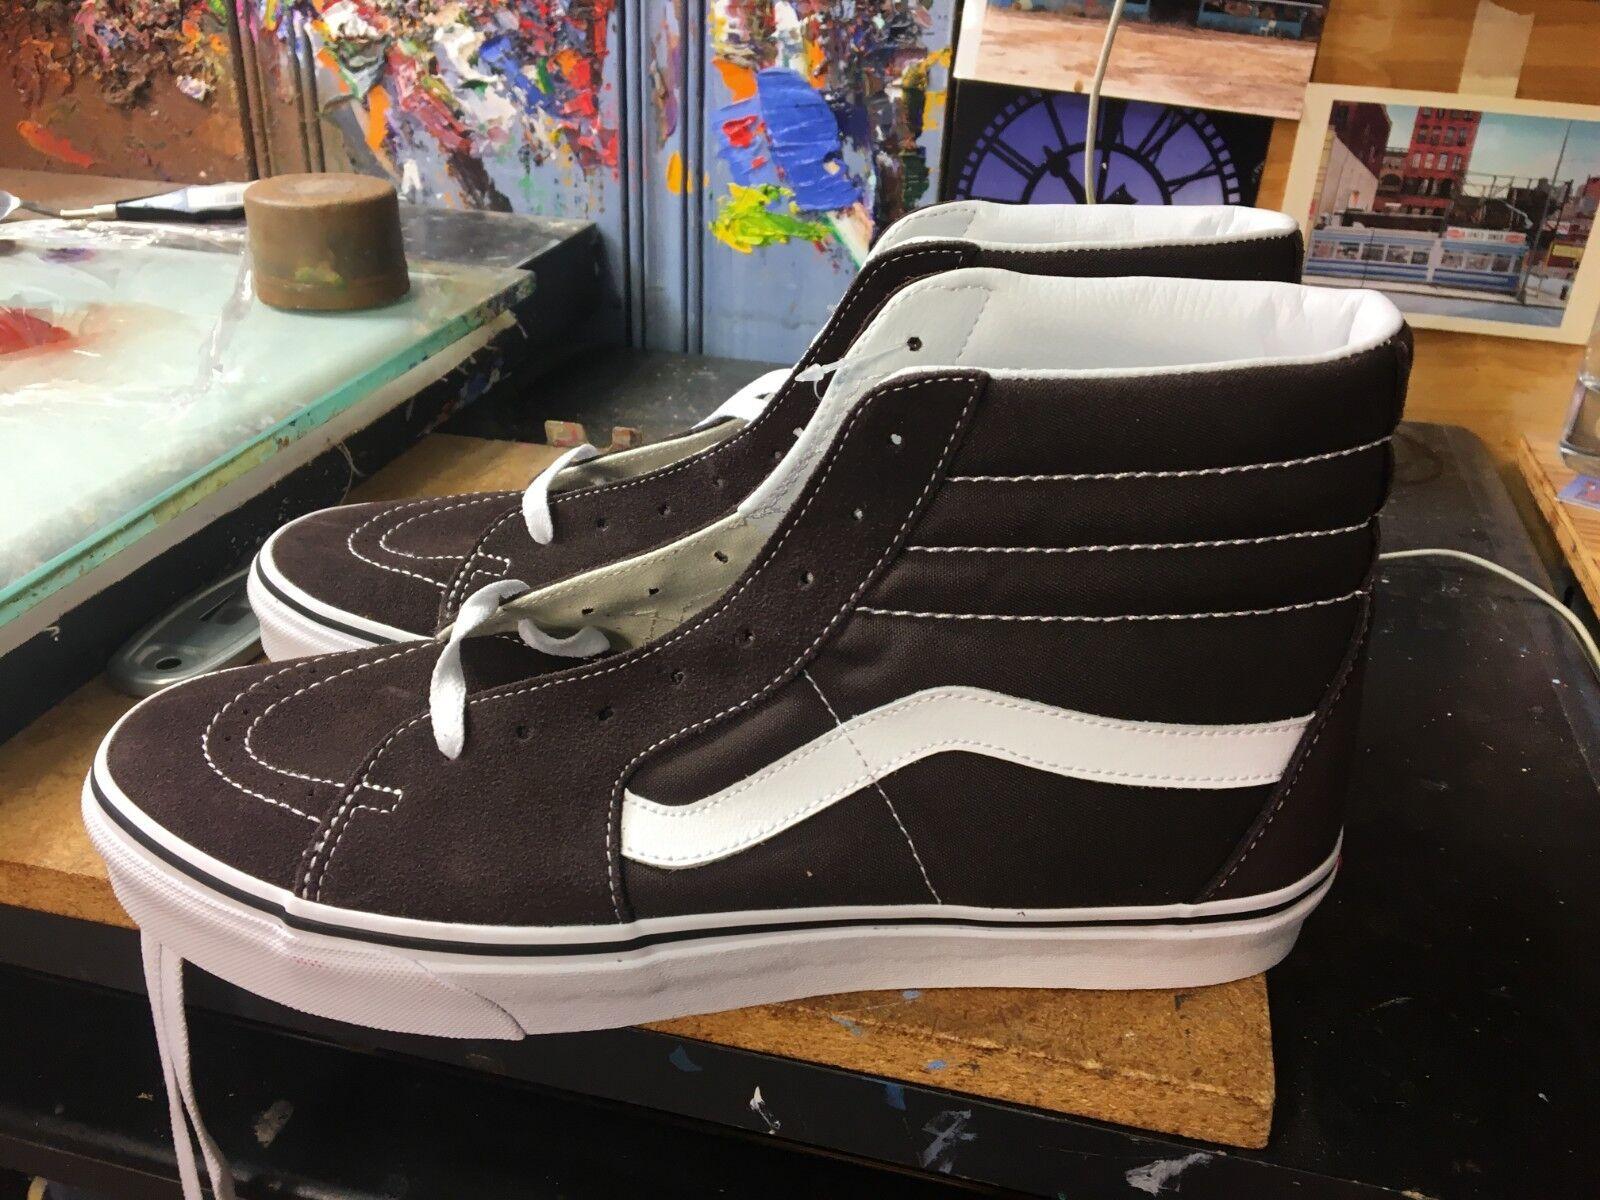 Vans Vans Vans SK8-Hi Chocolate Torte True bianca Dimensione US 11.5 Uomo VN0A38GEU5Z 97738a